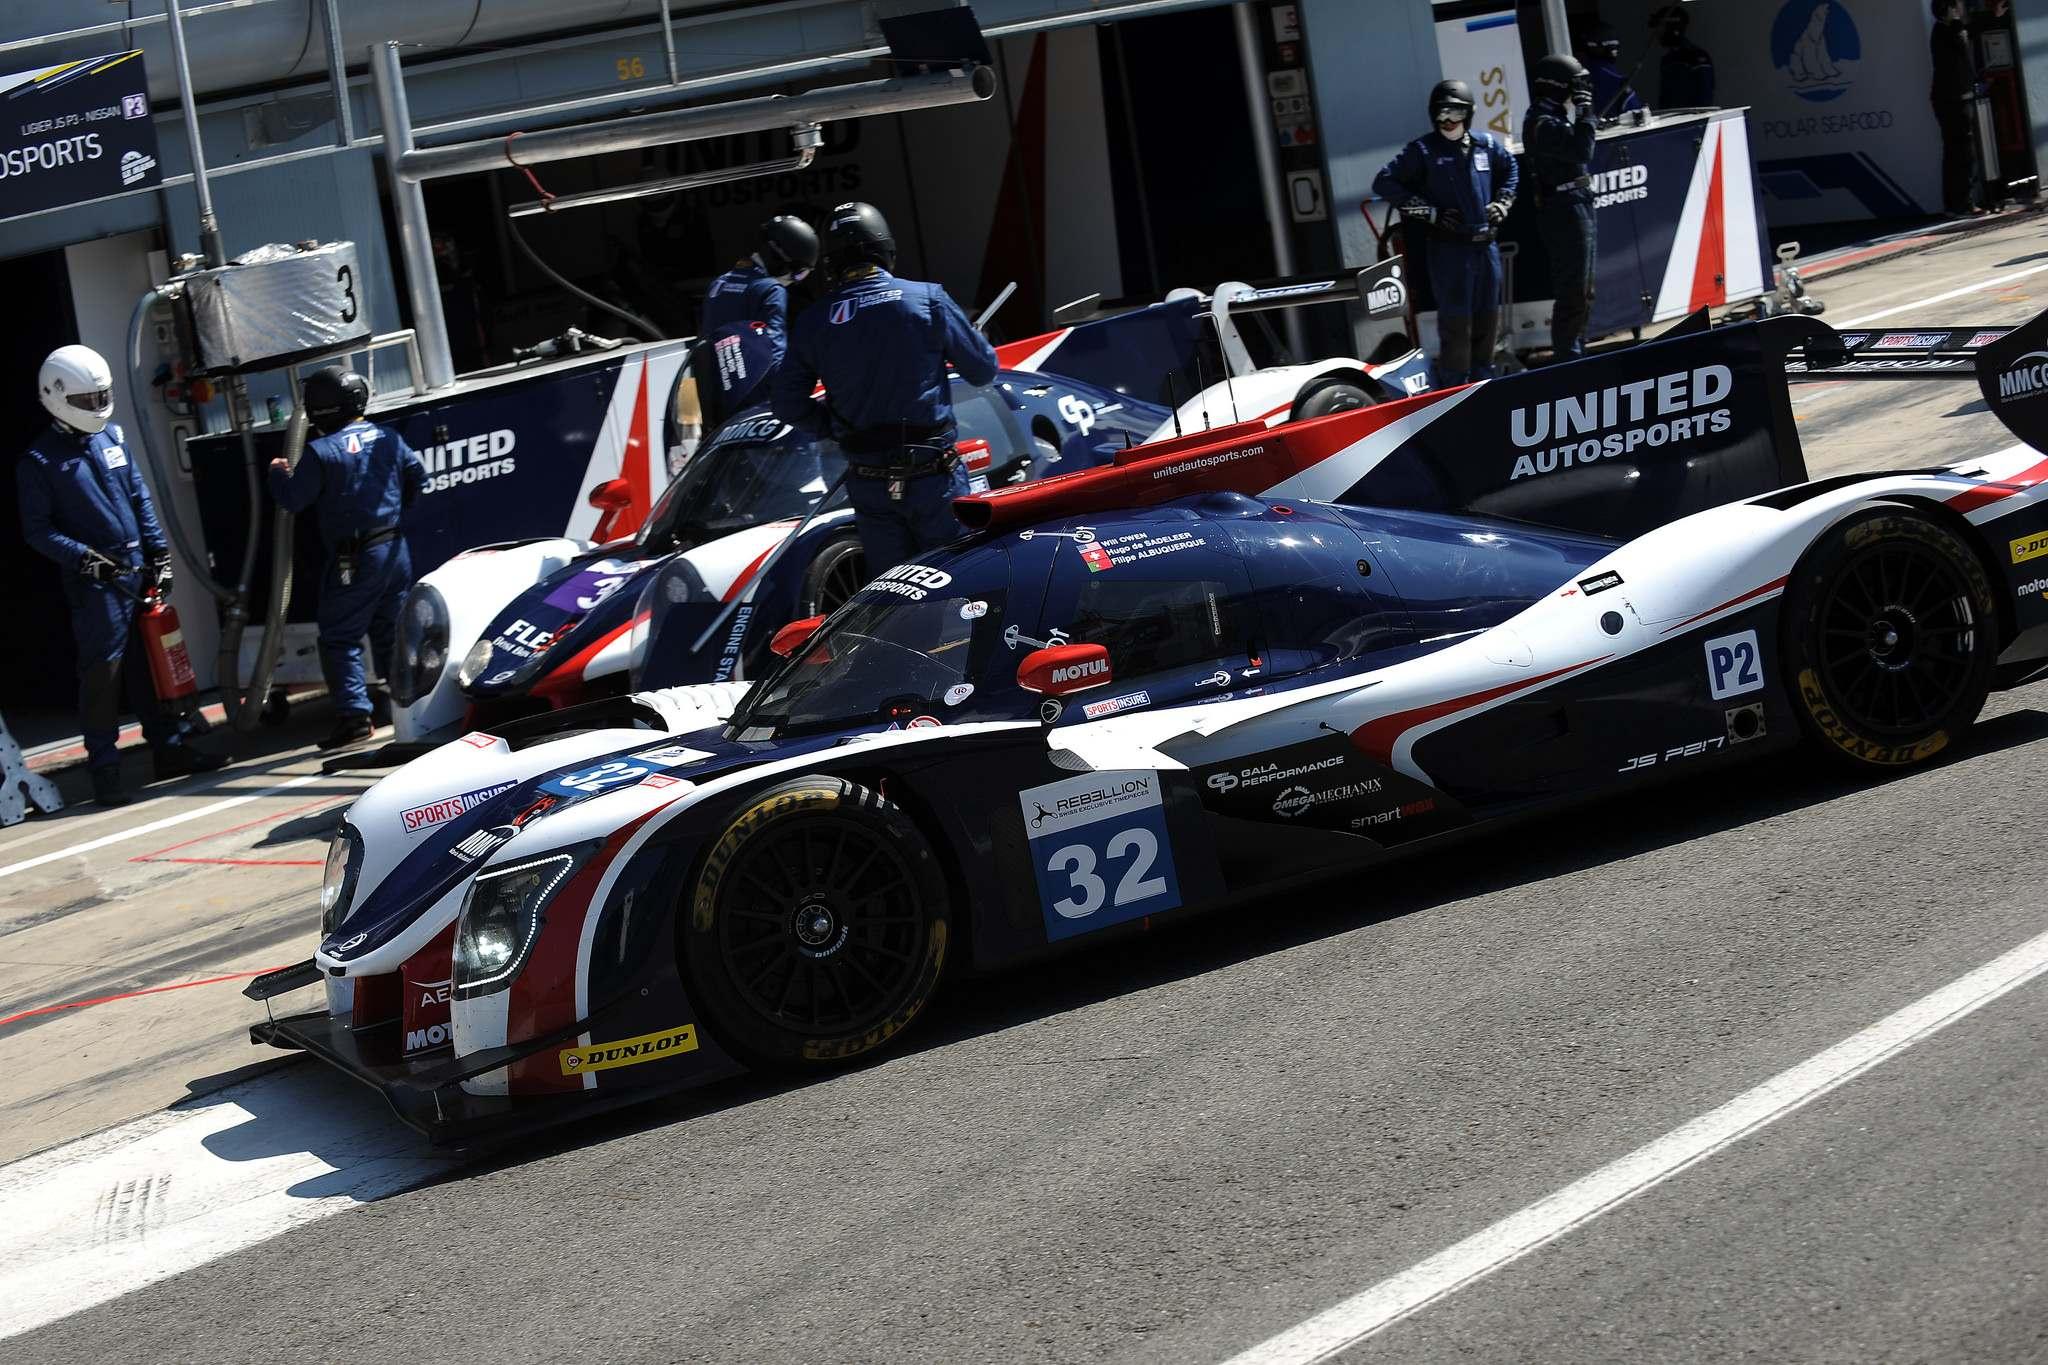 unitedautosports5 United Autosports in Monza